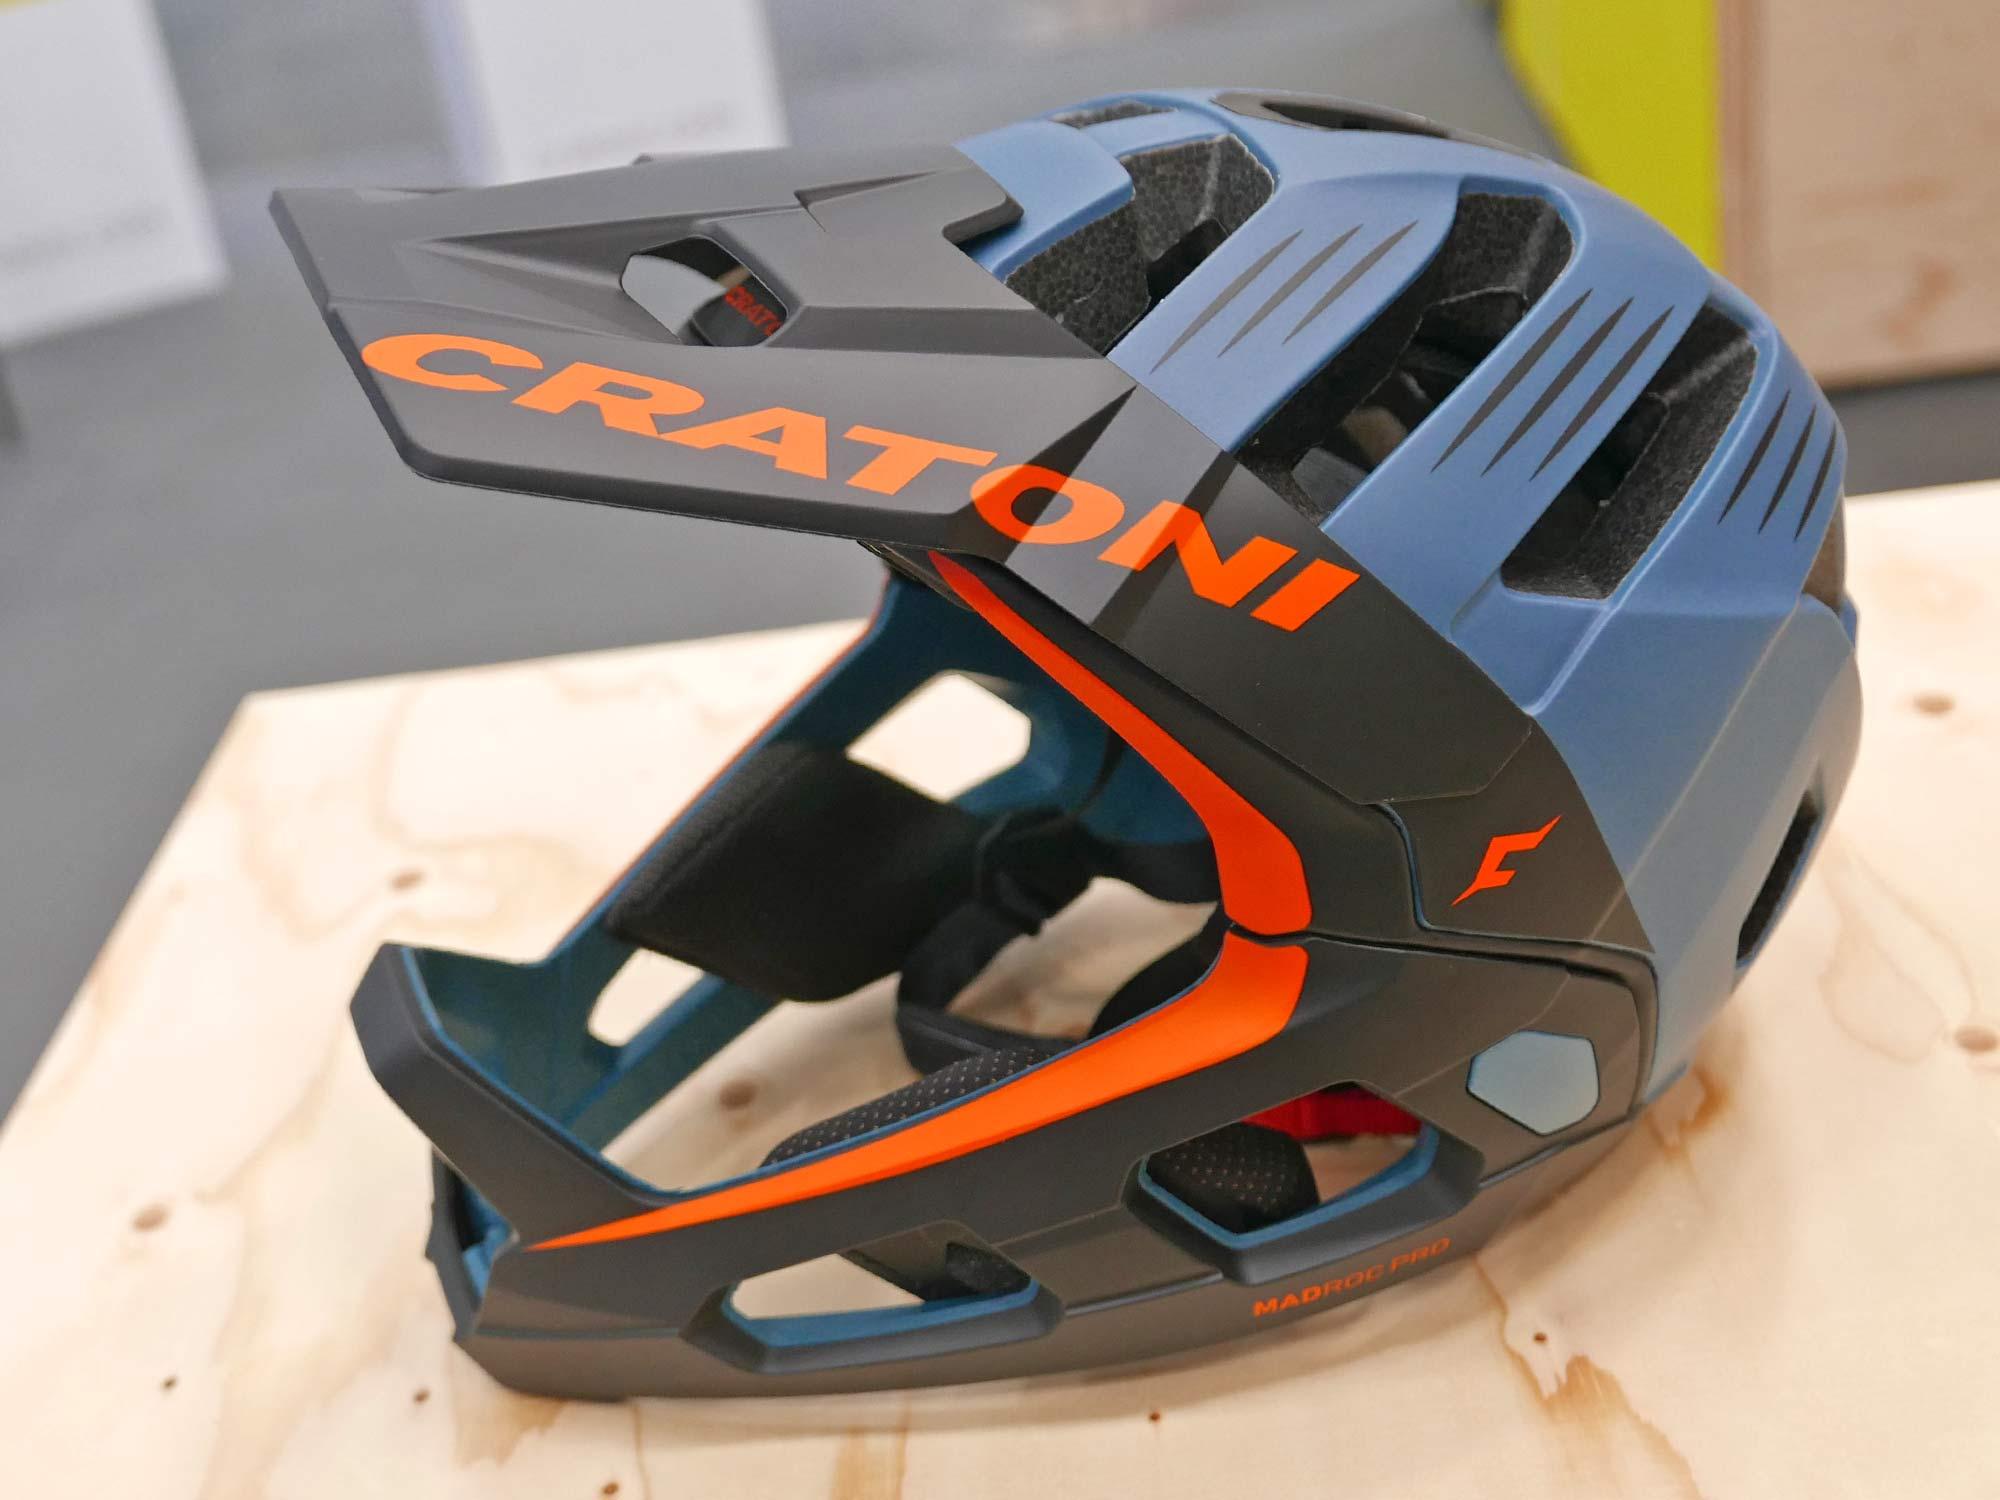 Madroc Pro smart convertible full face MTB helmet